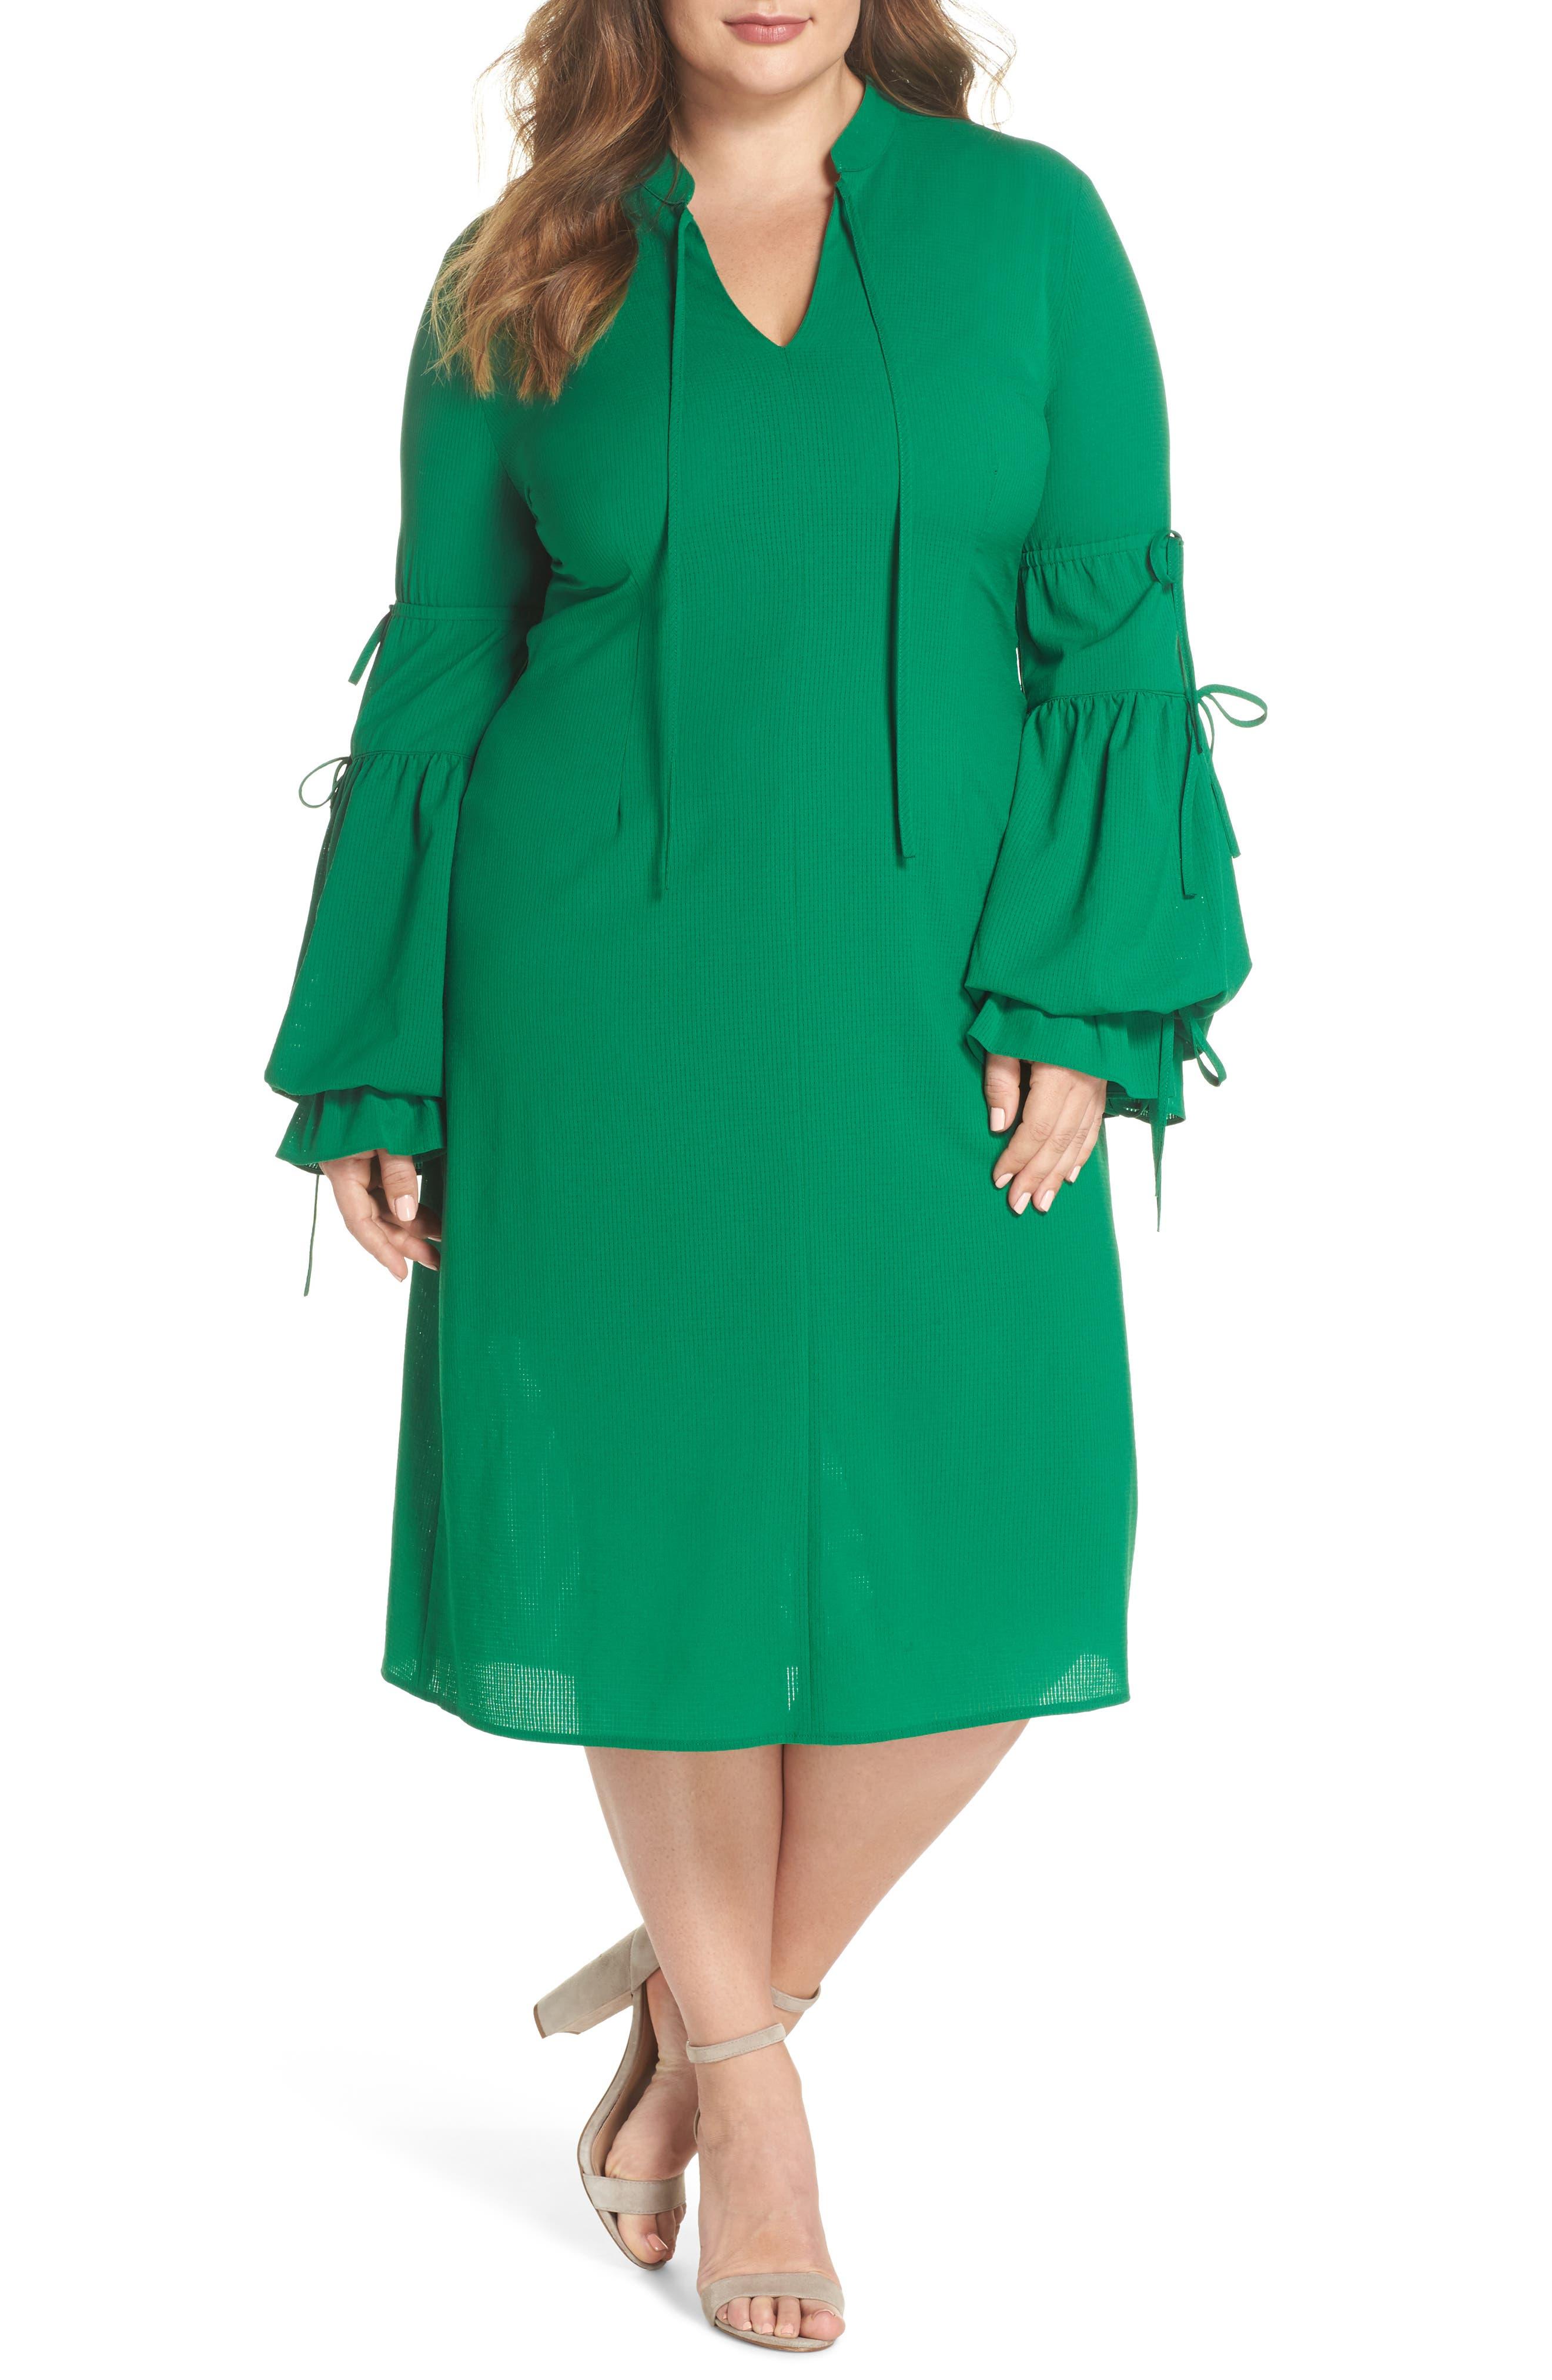 Leiko Antoinette Puff Sleeve Tea Dress,                         Main,                         color, 300